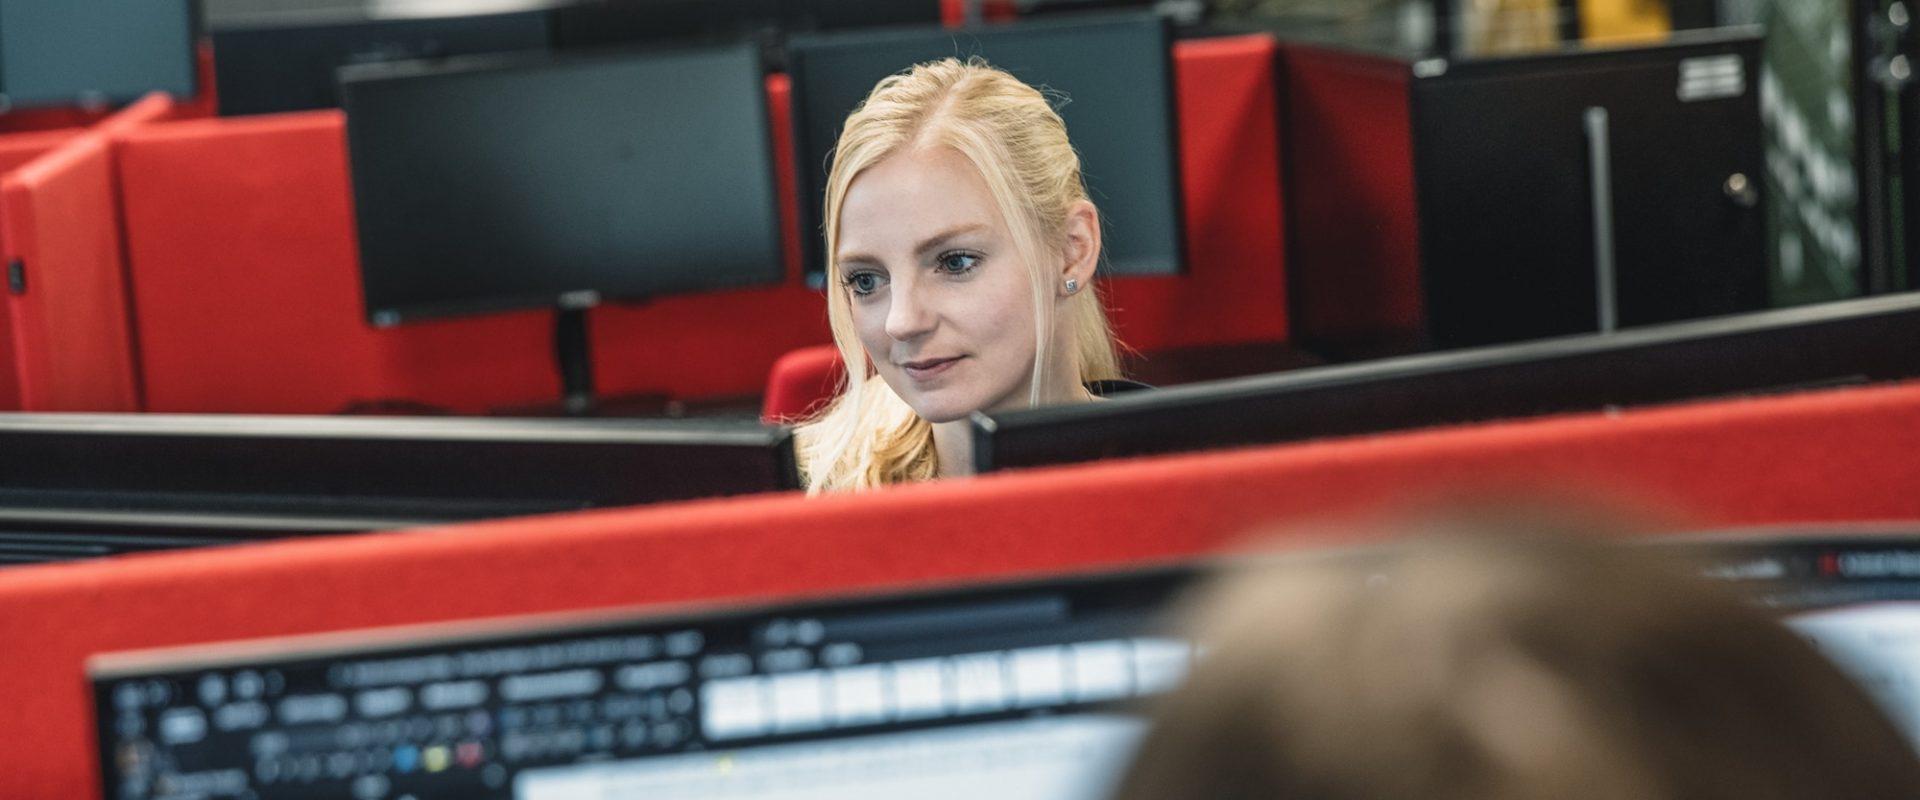 kvinnelig ansatt som jobber foran datamaskin i kontorlandskap hos Inventura.